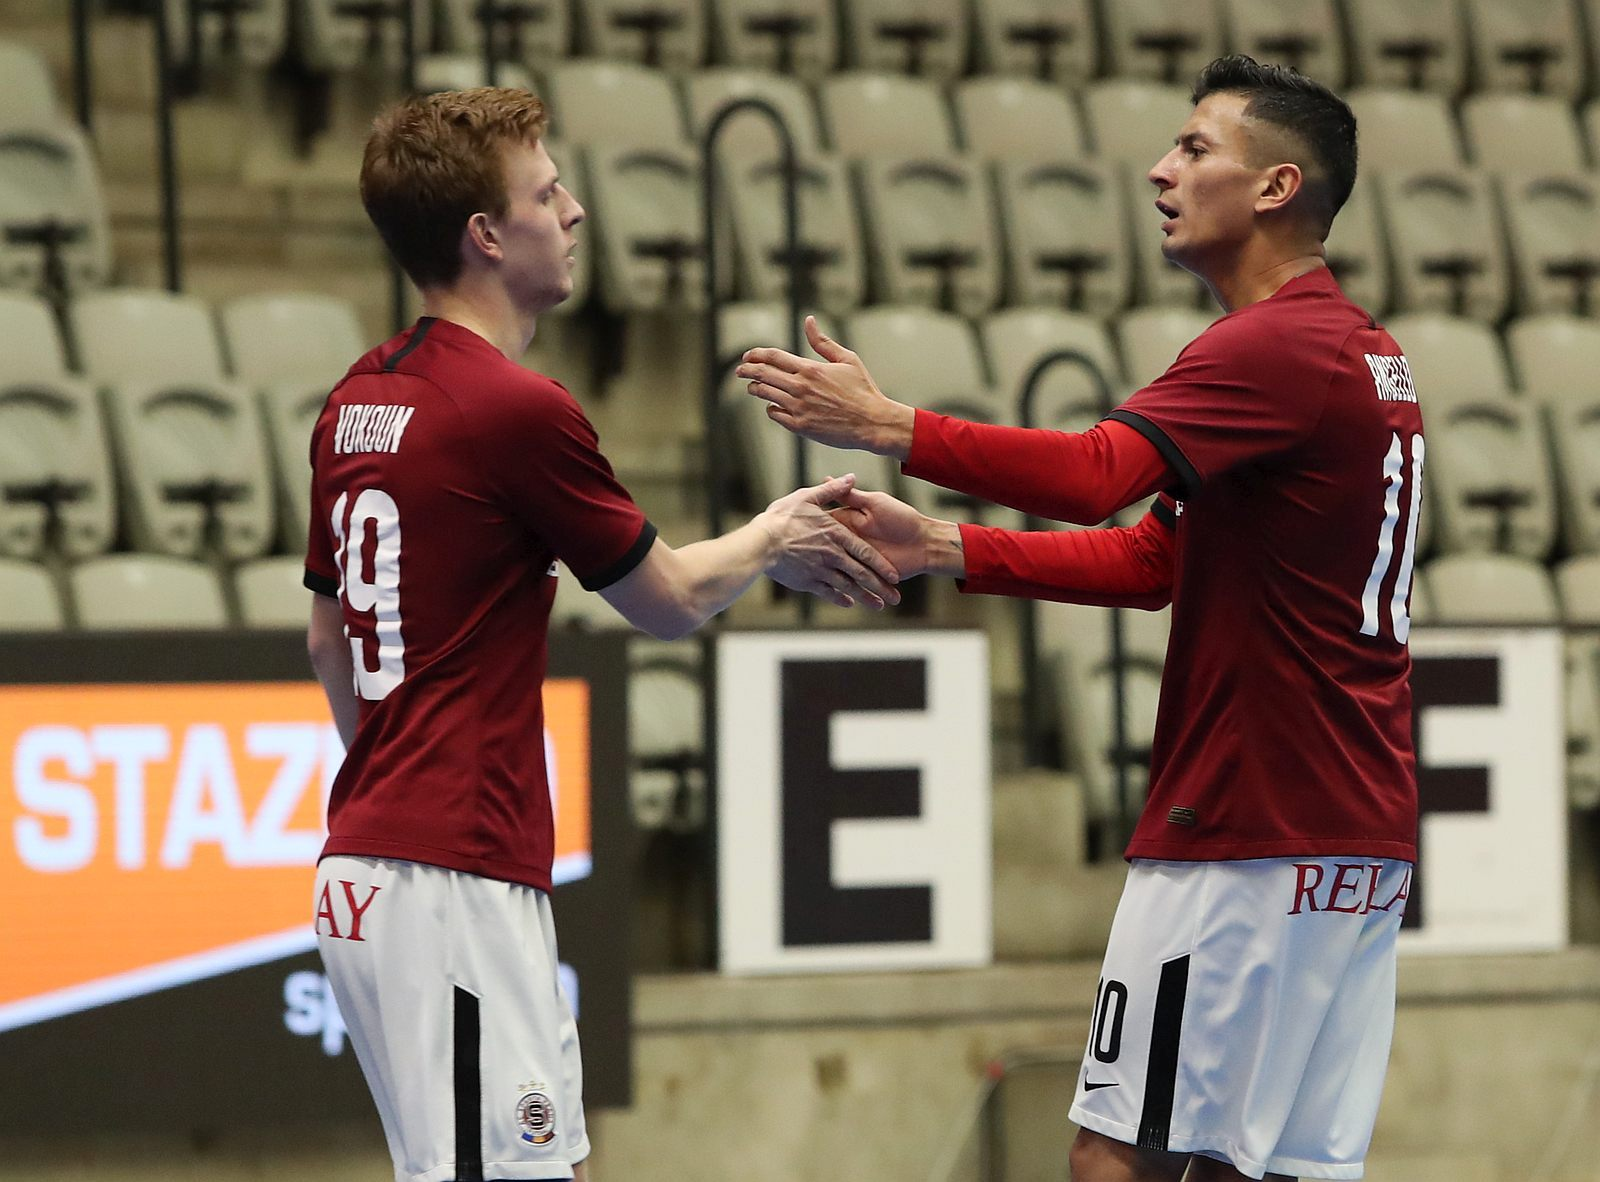 Sparta ukončila sérii bez bodů, Dynamo porazila 4:1